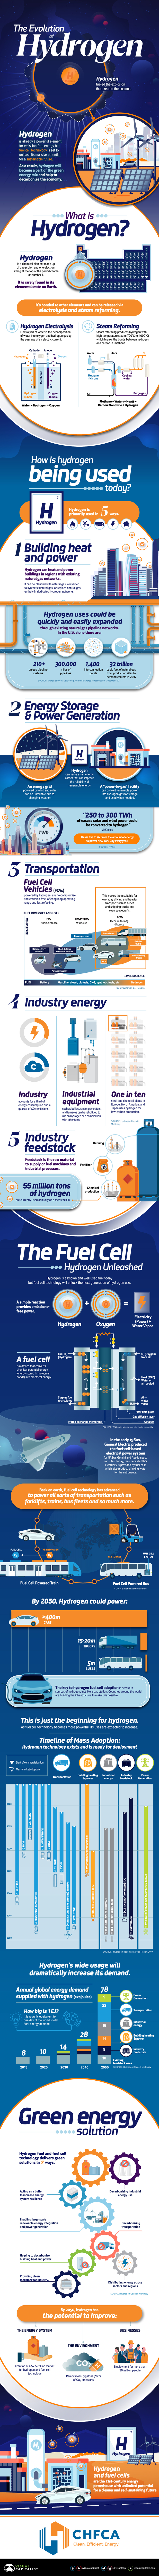 Evolution Of Hydrogen